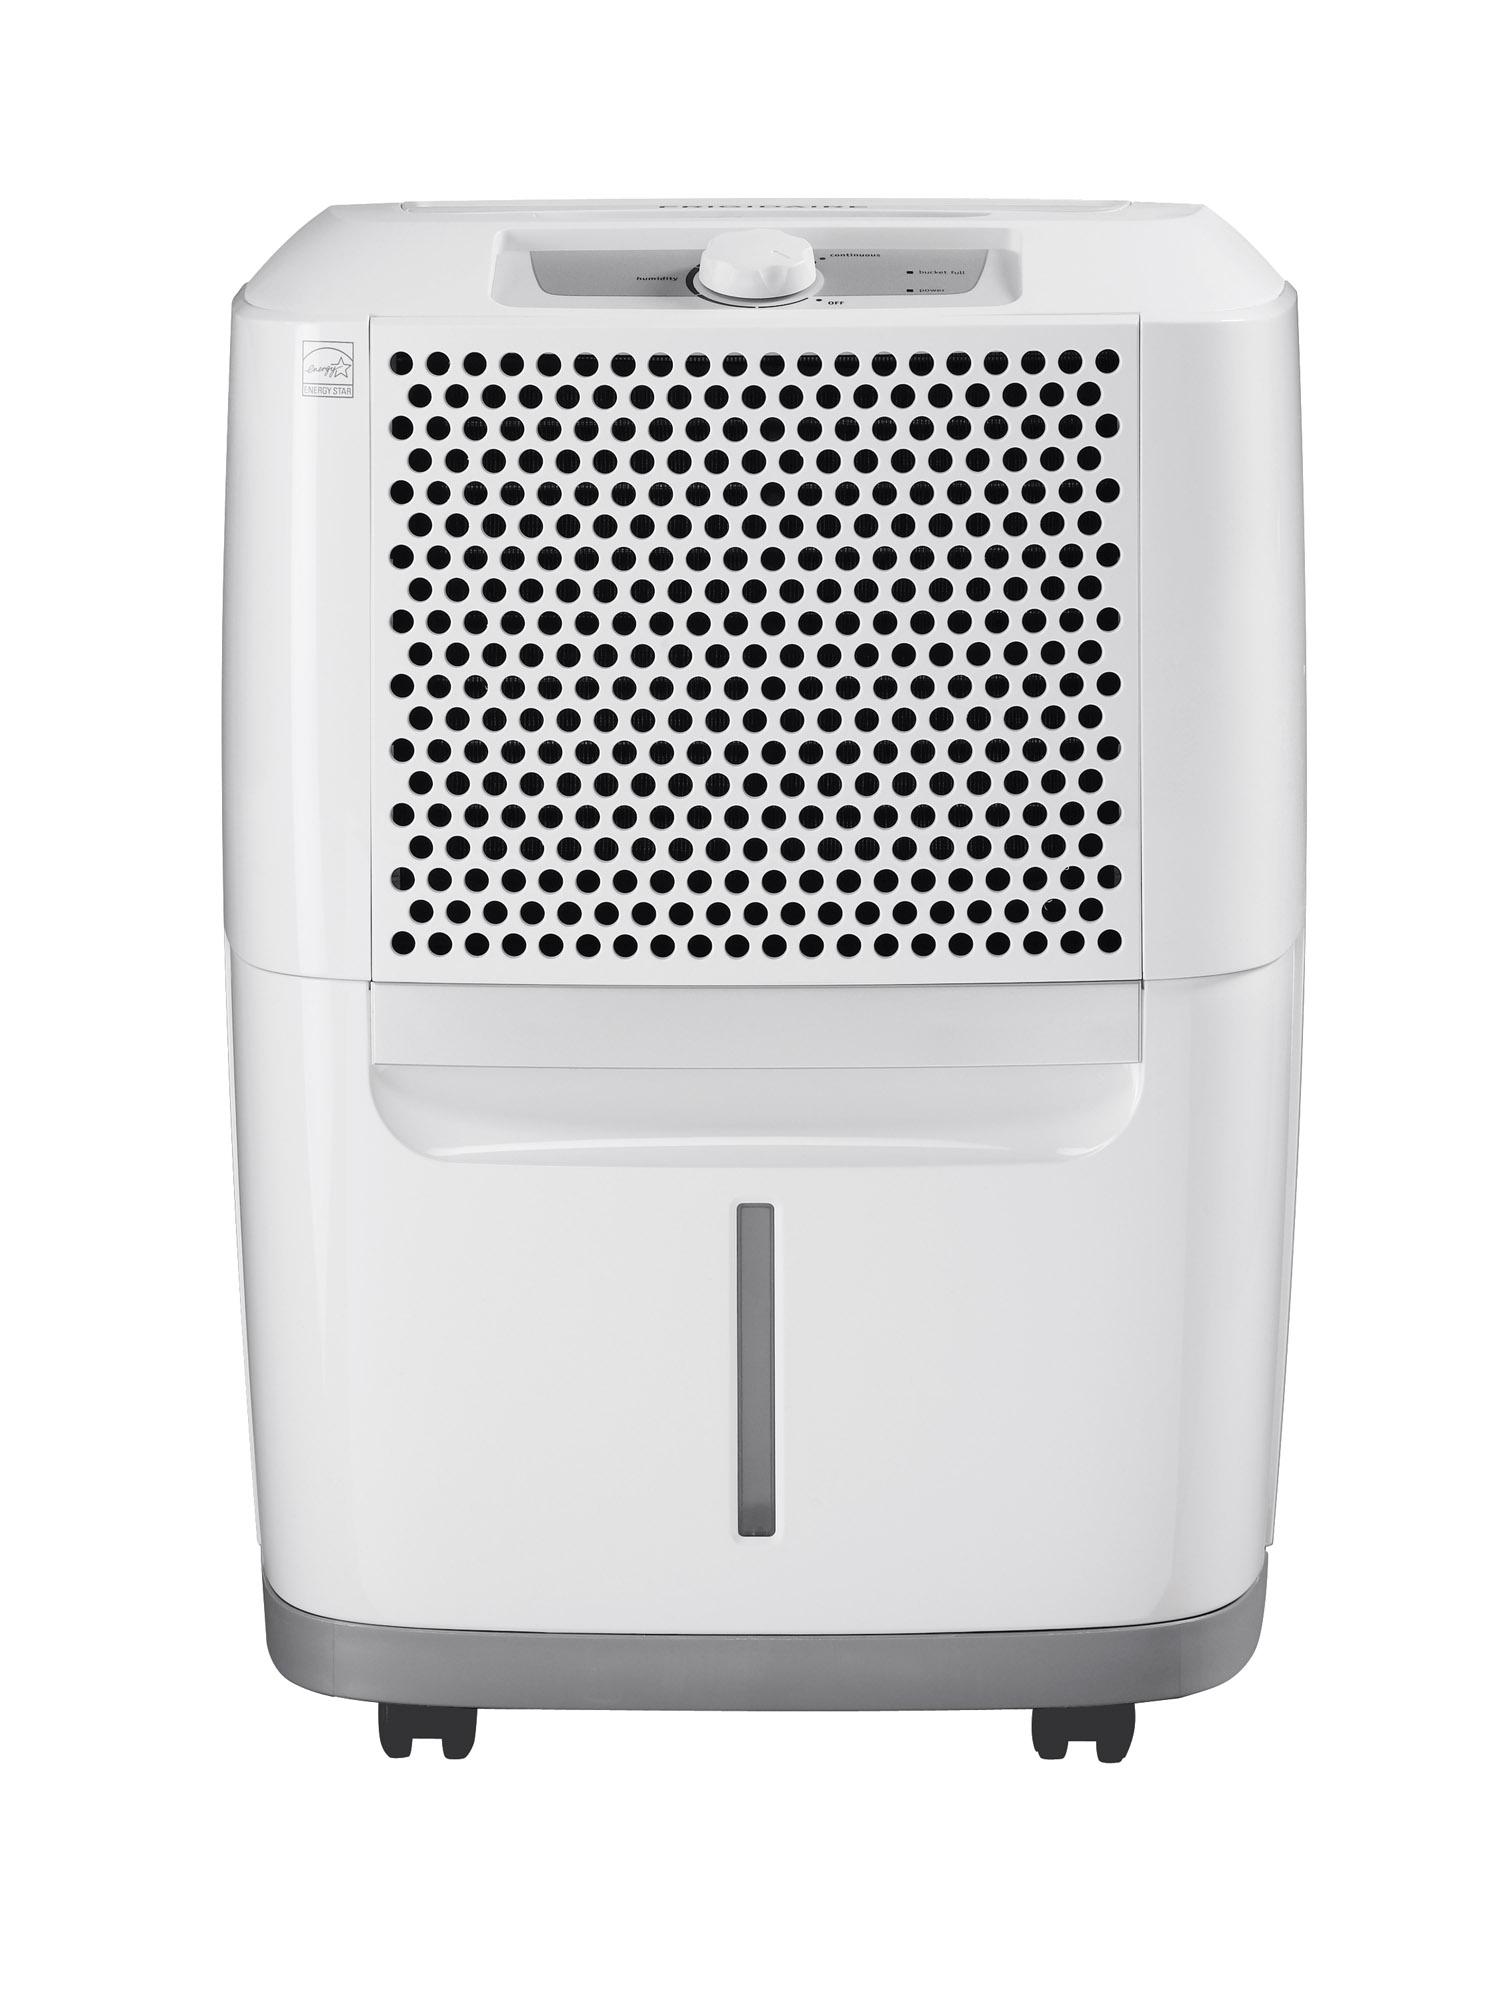 dehumidifier frigidaire dehumidifiers upcitemdb electrolux